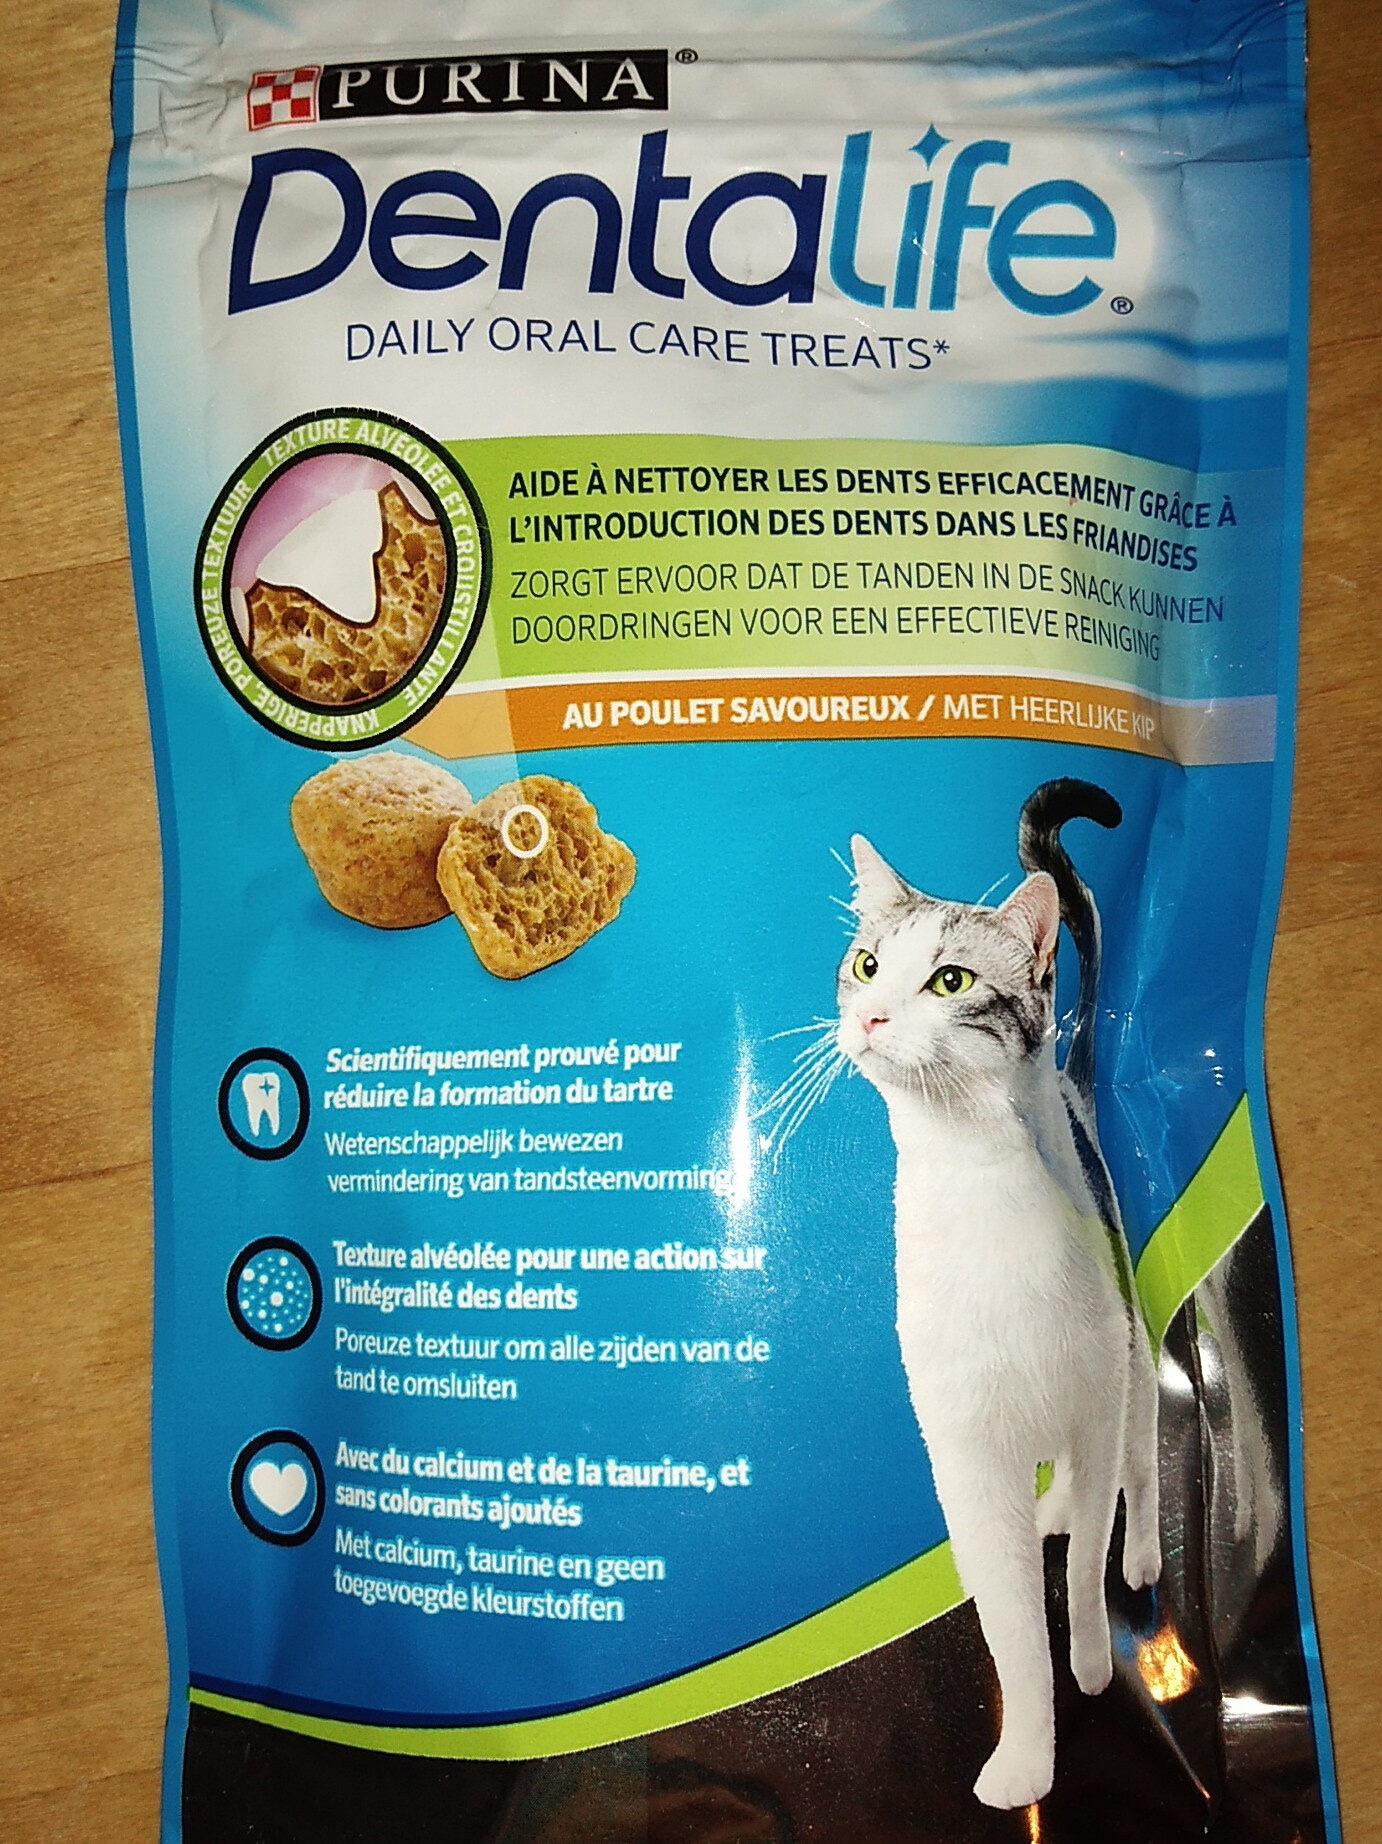 dentalife - Product